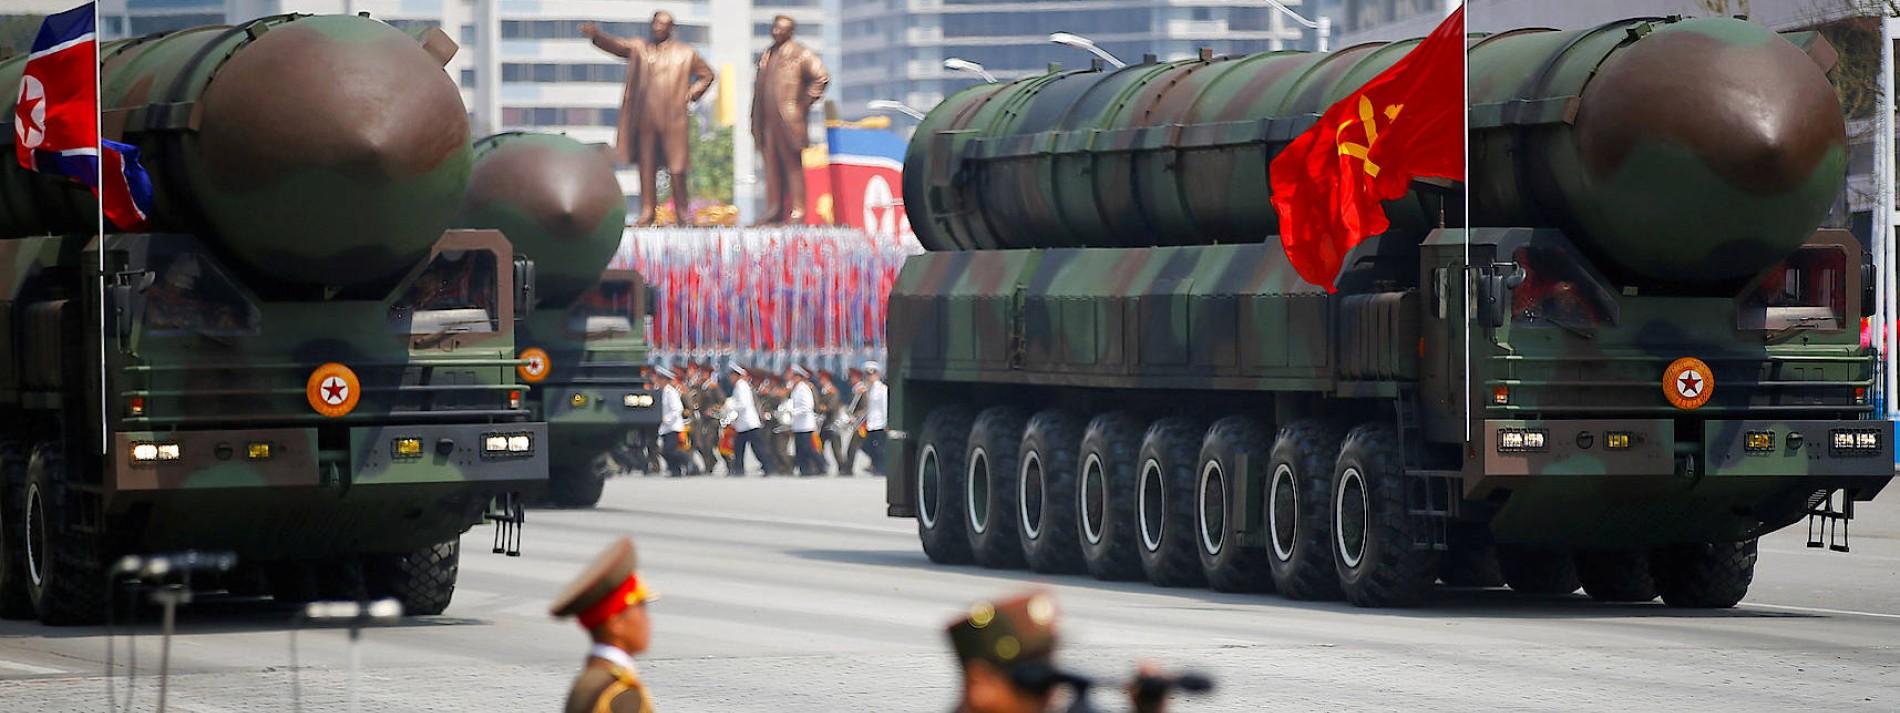 Spekulationen um neue Atomwaffentests